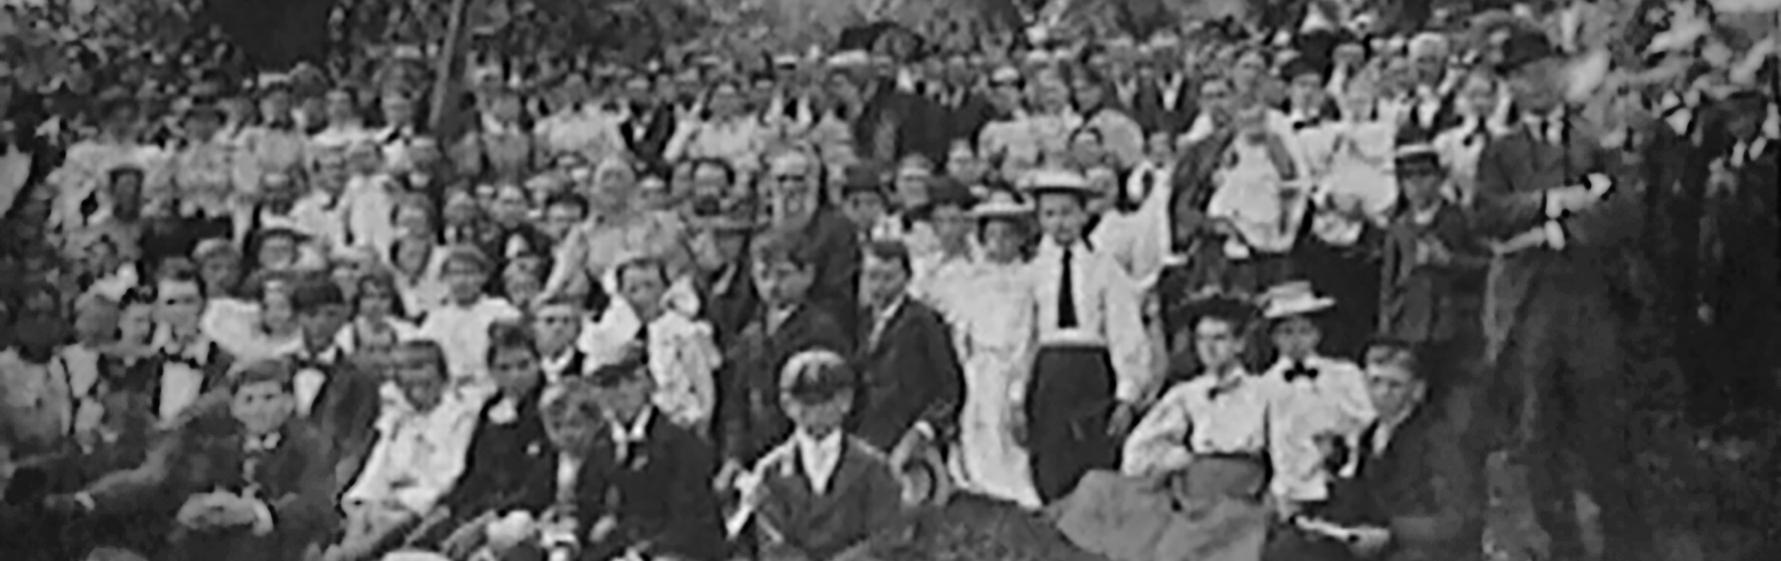 Frampton reunion 1896